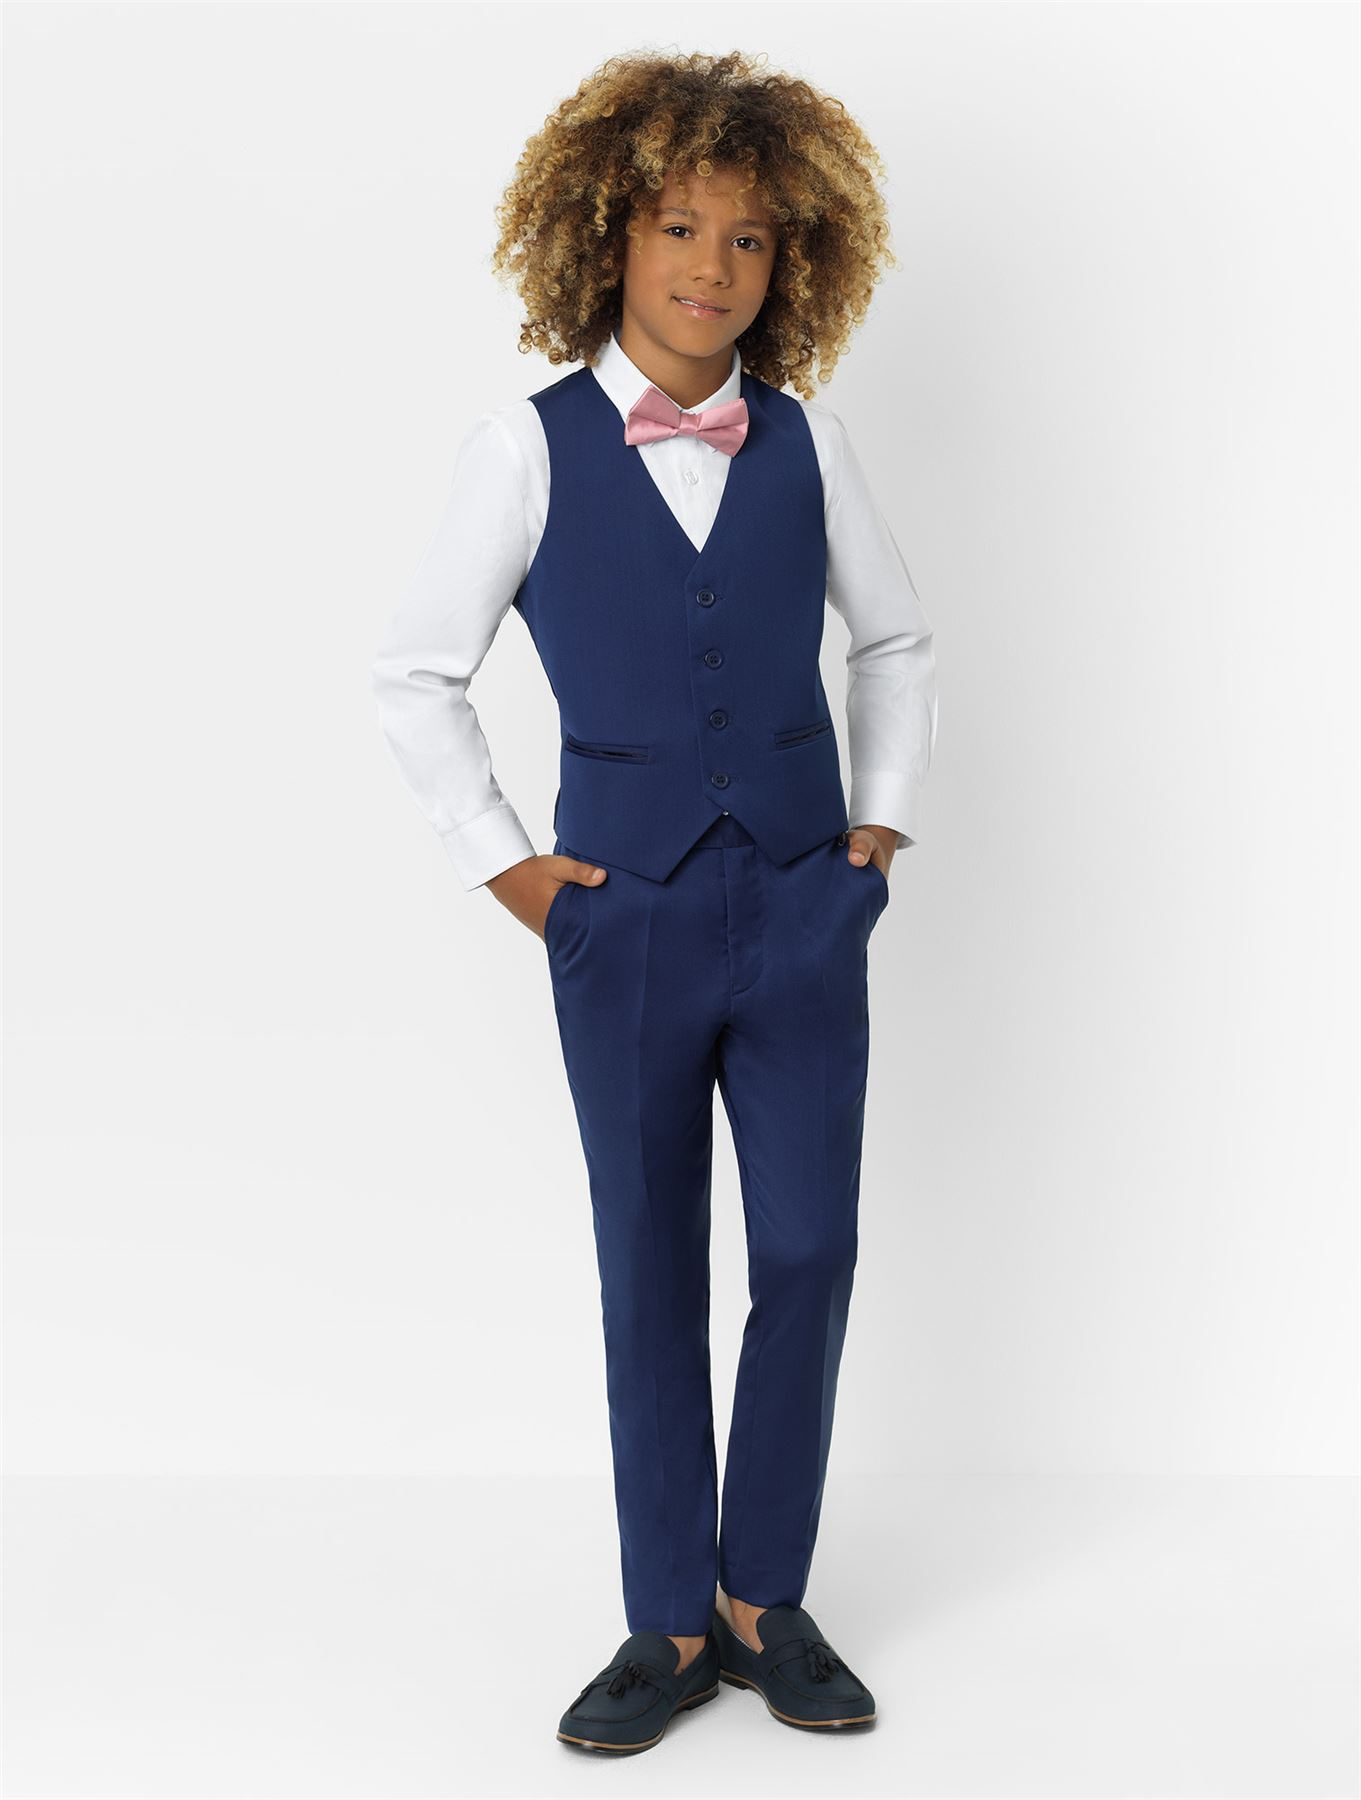 Modern-Fit Tuxedo 1-14 Years Boys Black Three-Piece Prom Suit Roco